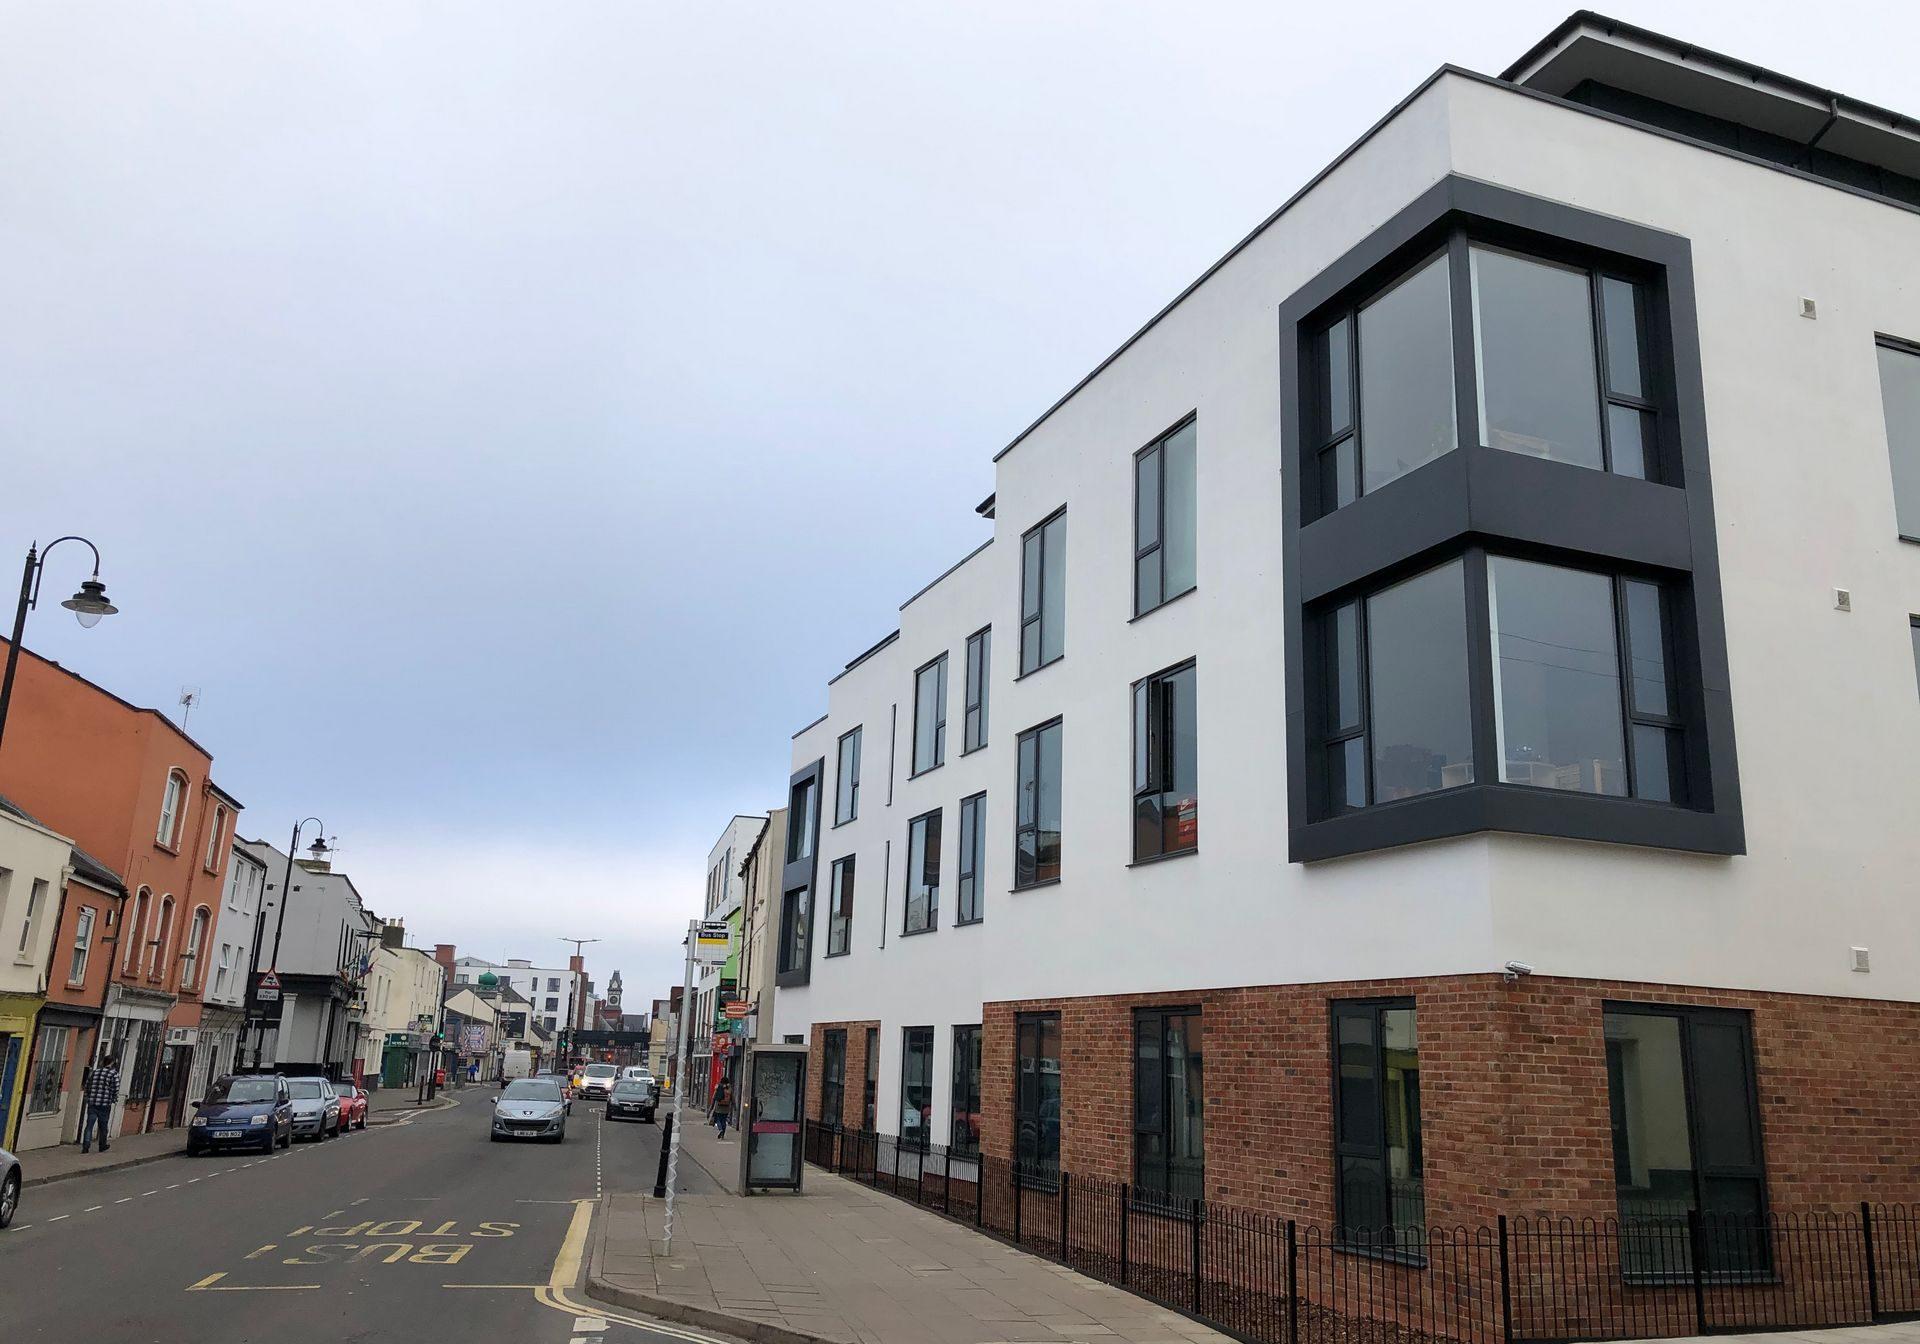 43 unit town centre development, Cheltenham